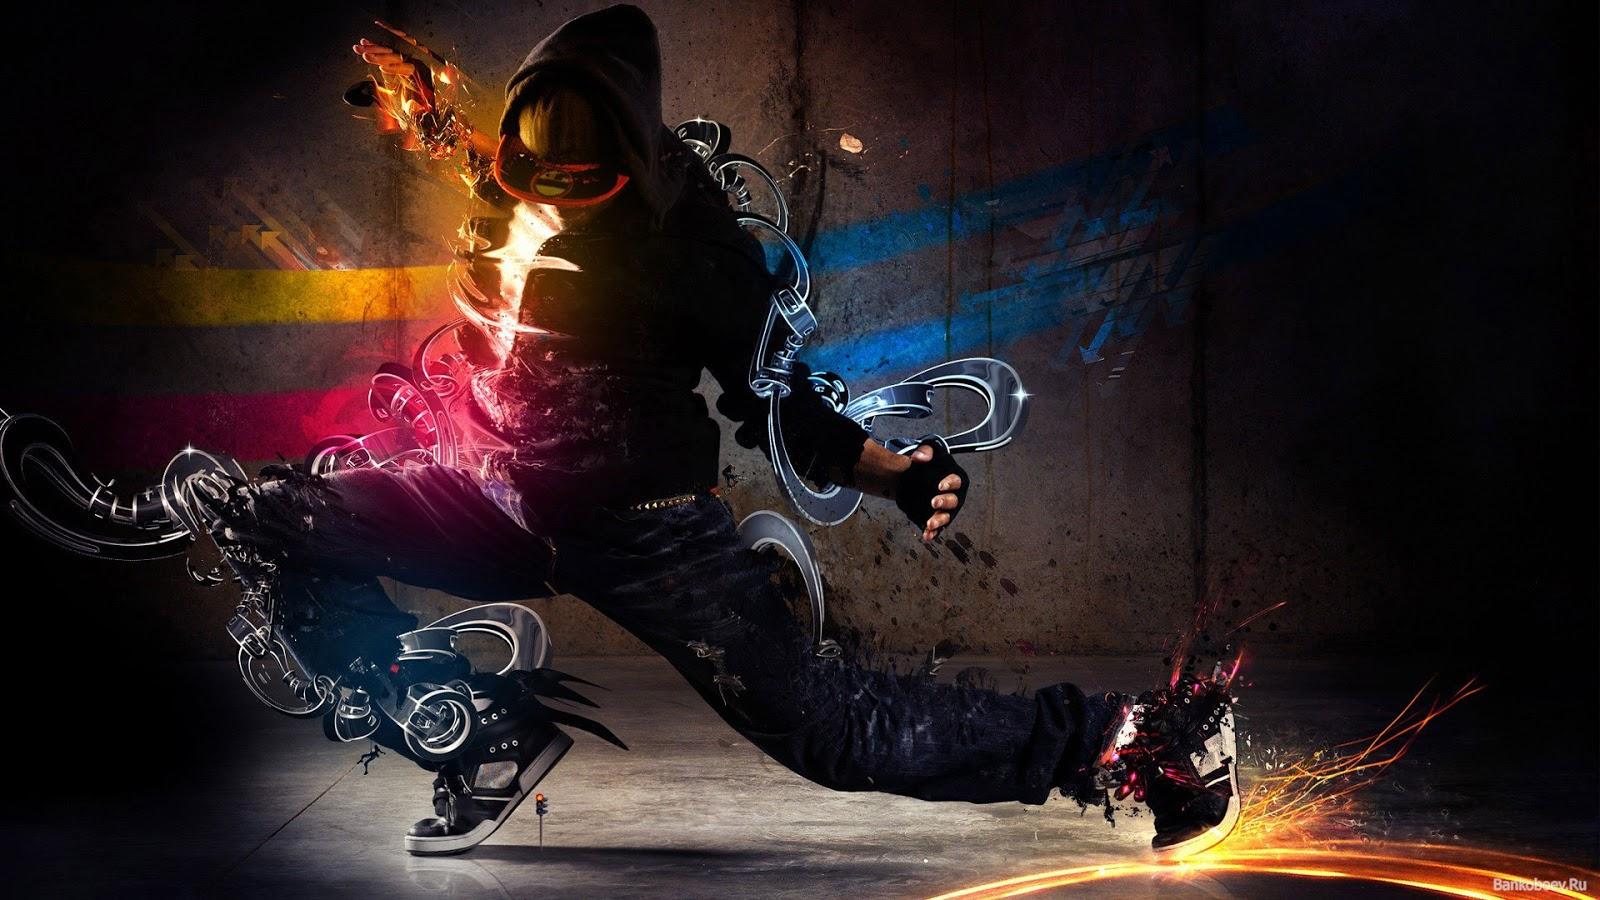 http://2.bp.blogspot.com/-KN6GzLyj3Xg/UIrPqEhywWI/AAAAAAAAGfg/DaOoP1tz4uQ/s1600/3D+Dance+Desktop+Wallpapers+HD+2012-2013+10.jpg